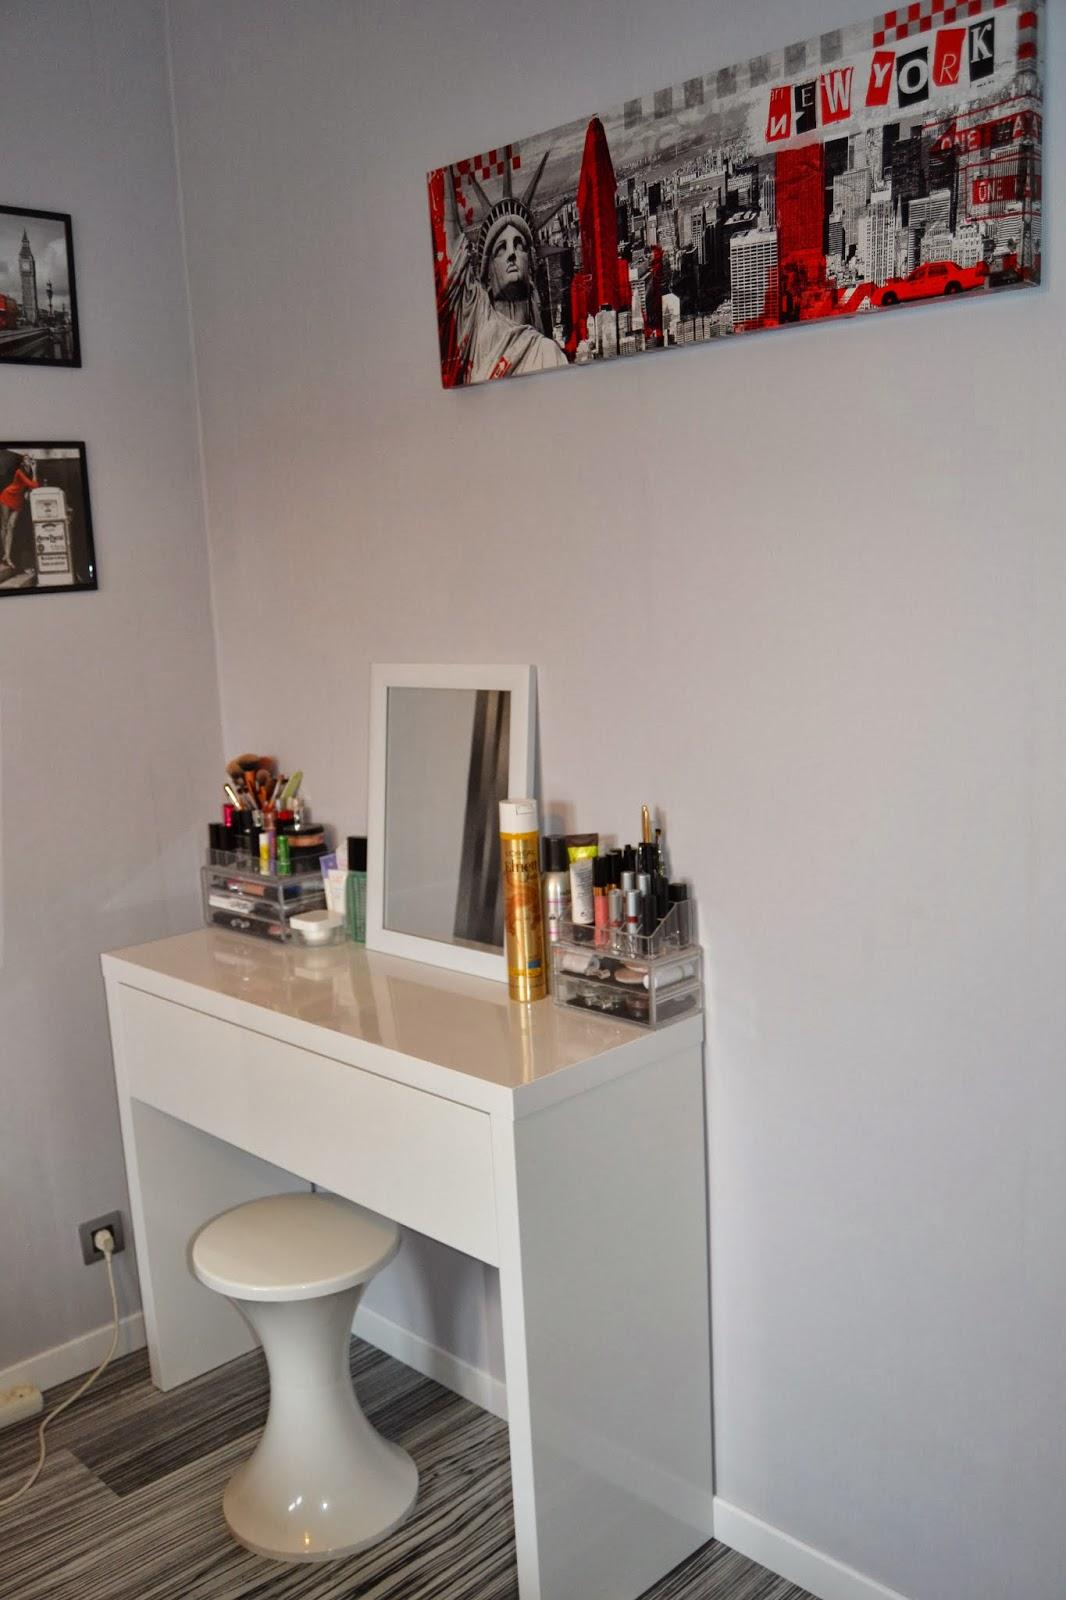 lanantaize mon rangement makeup lanantaize blog lifestyle food geek sur nantes. Black Bedroom Furniture Sets. Home Design Ideas